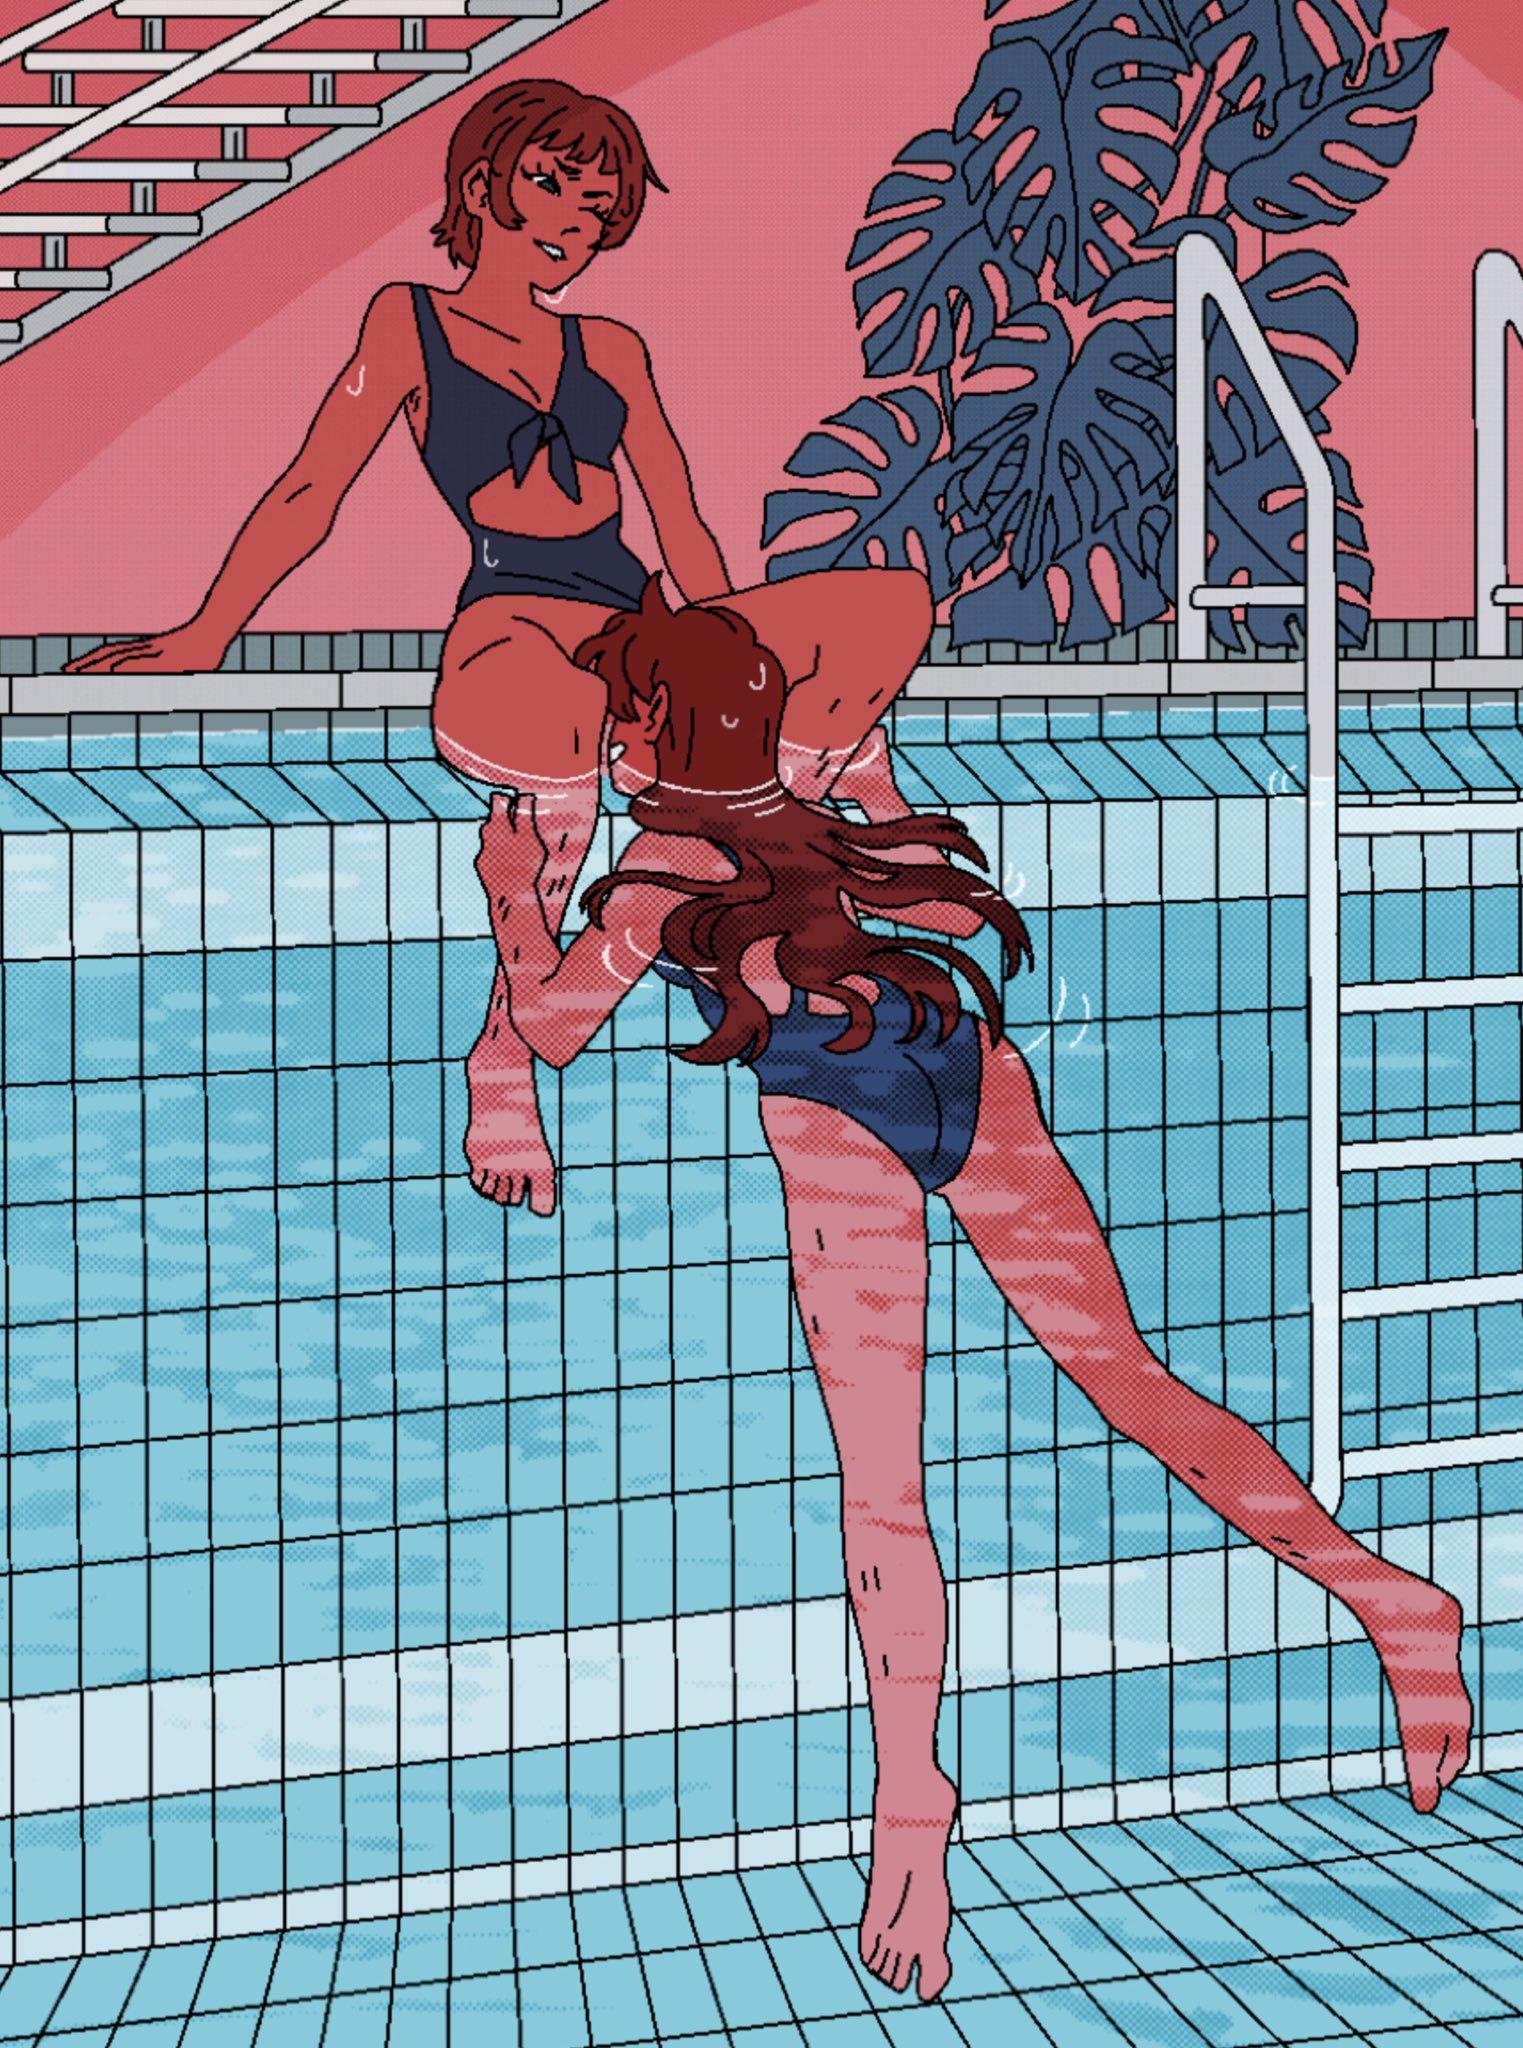 Poolside Romance